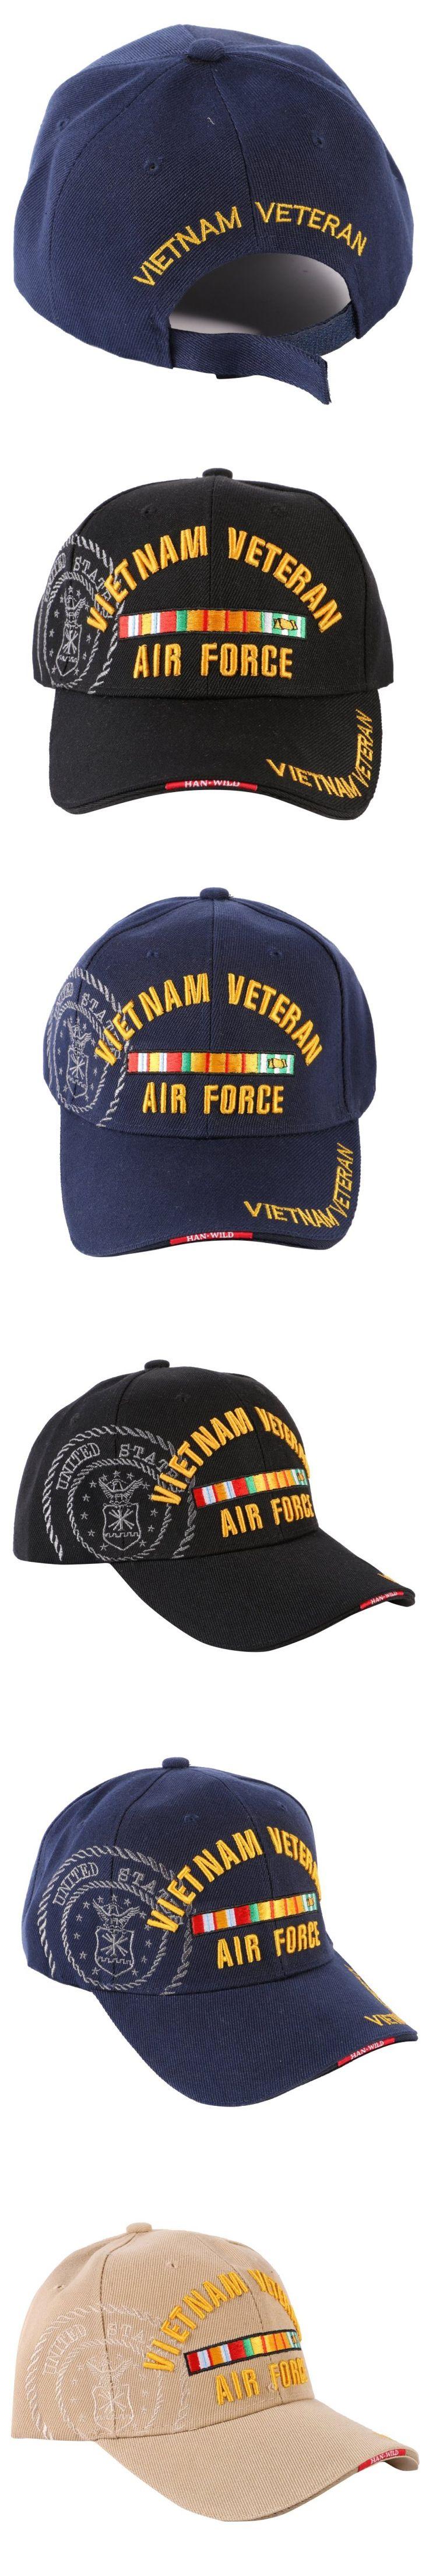 Winter Hats Unisex Hair Accessories Baseball Cap Cotton Gorras Memorable Air Force Cap Snapback US Army Hats